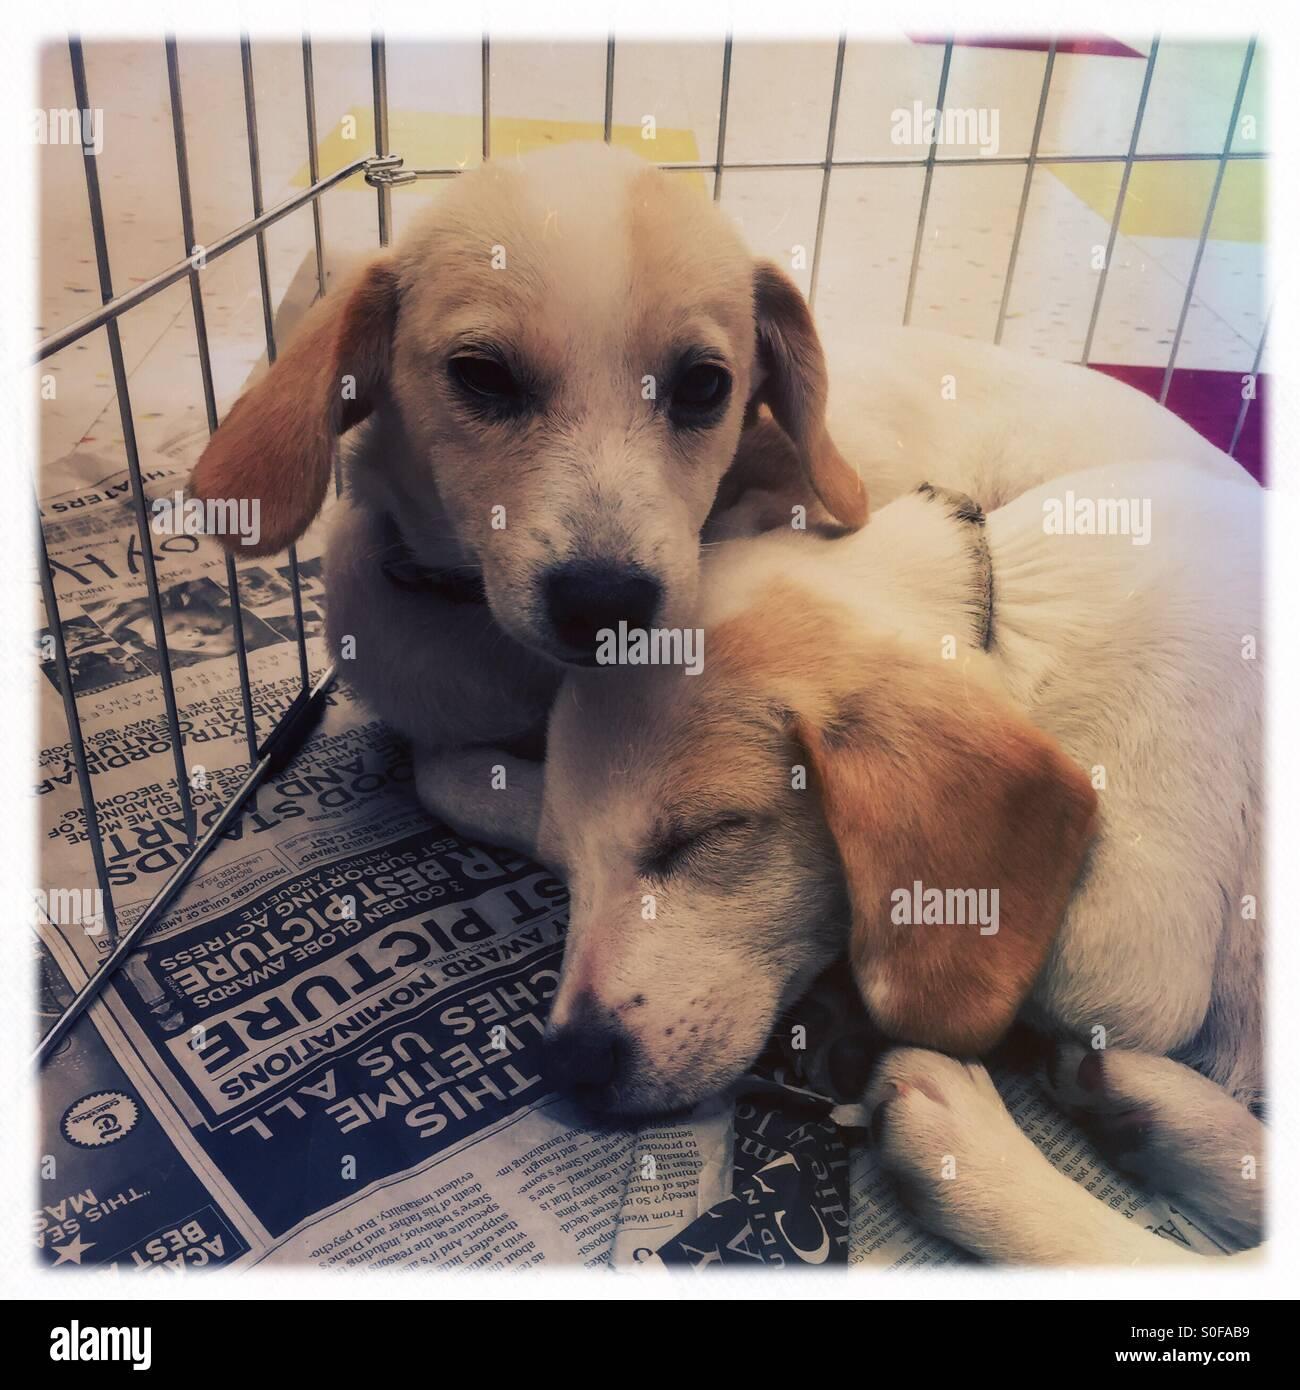 Puppy Love Stock Photo: 310124061 - Alamy